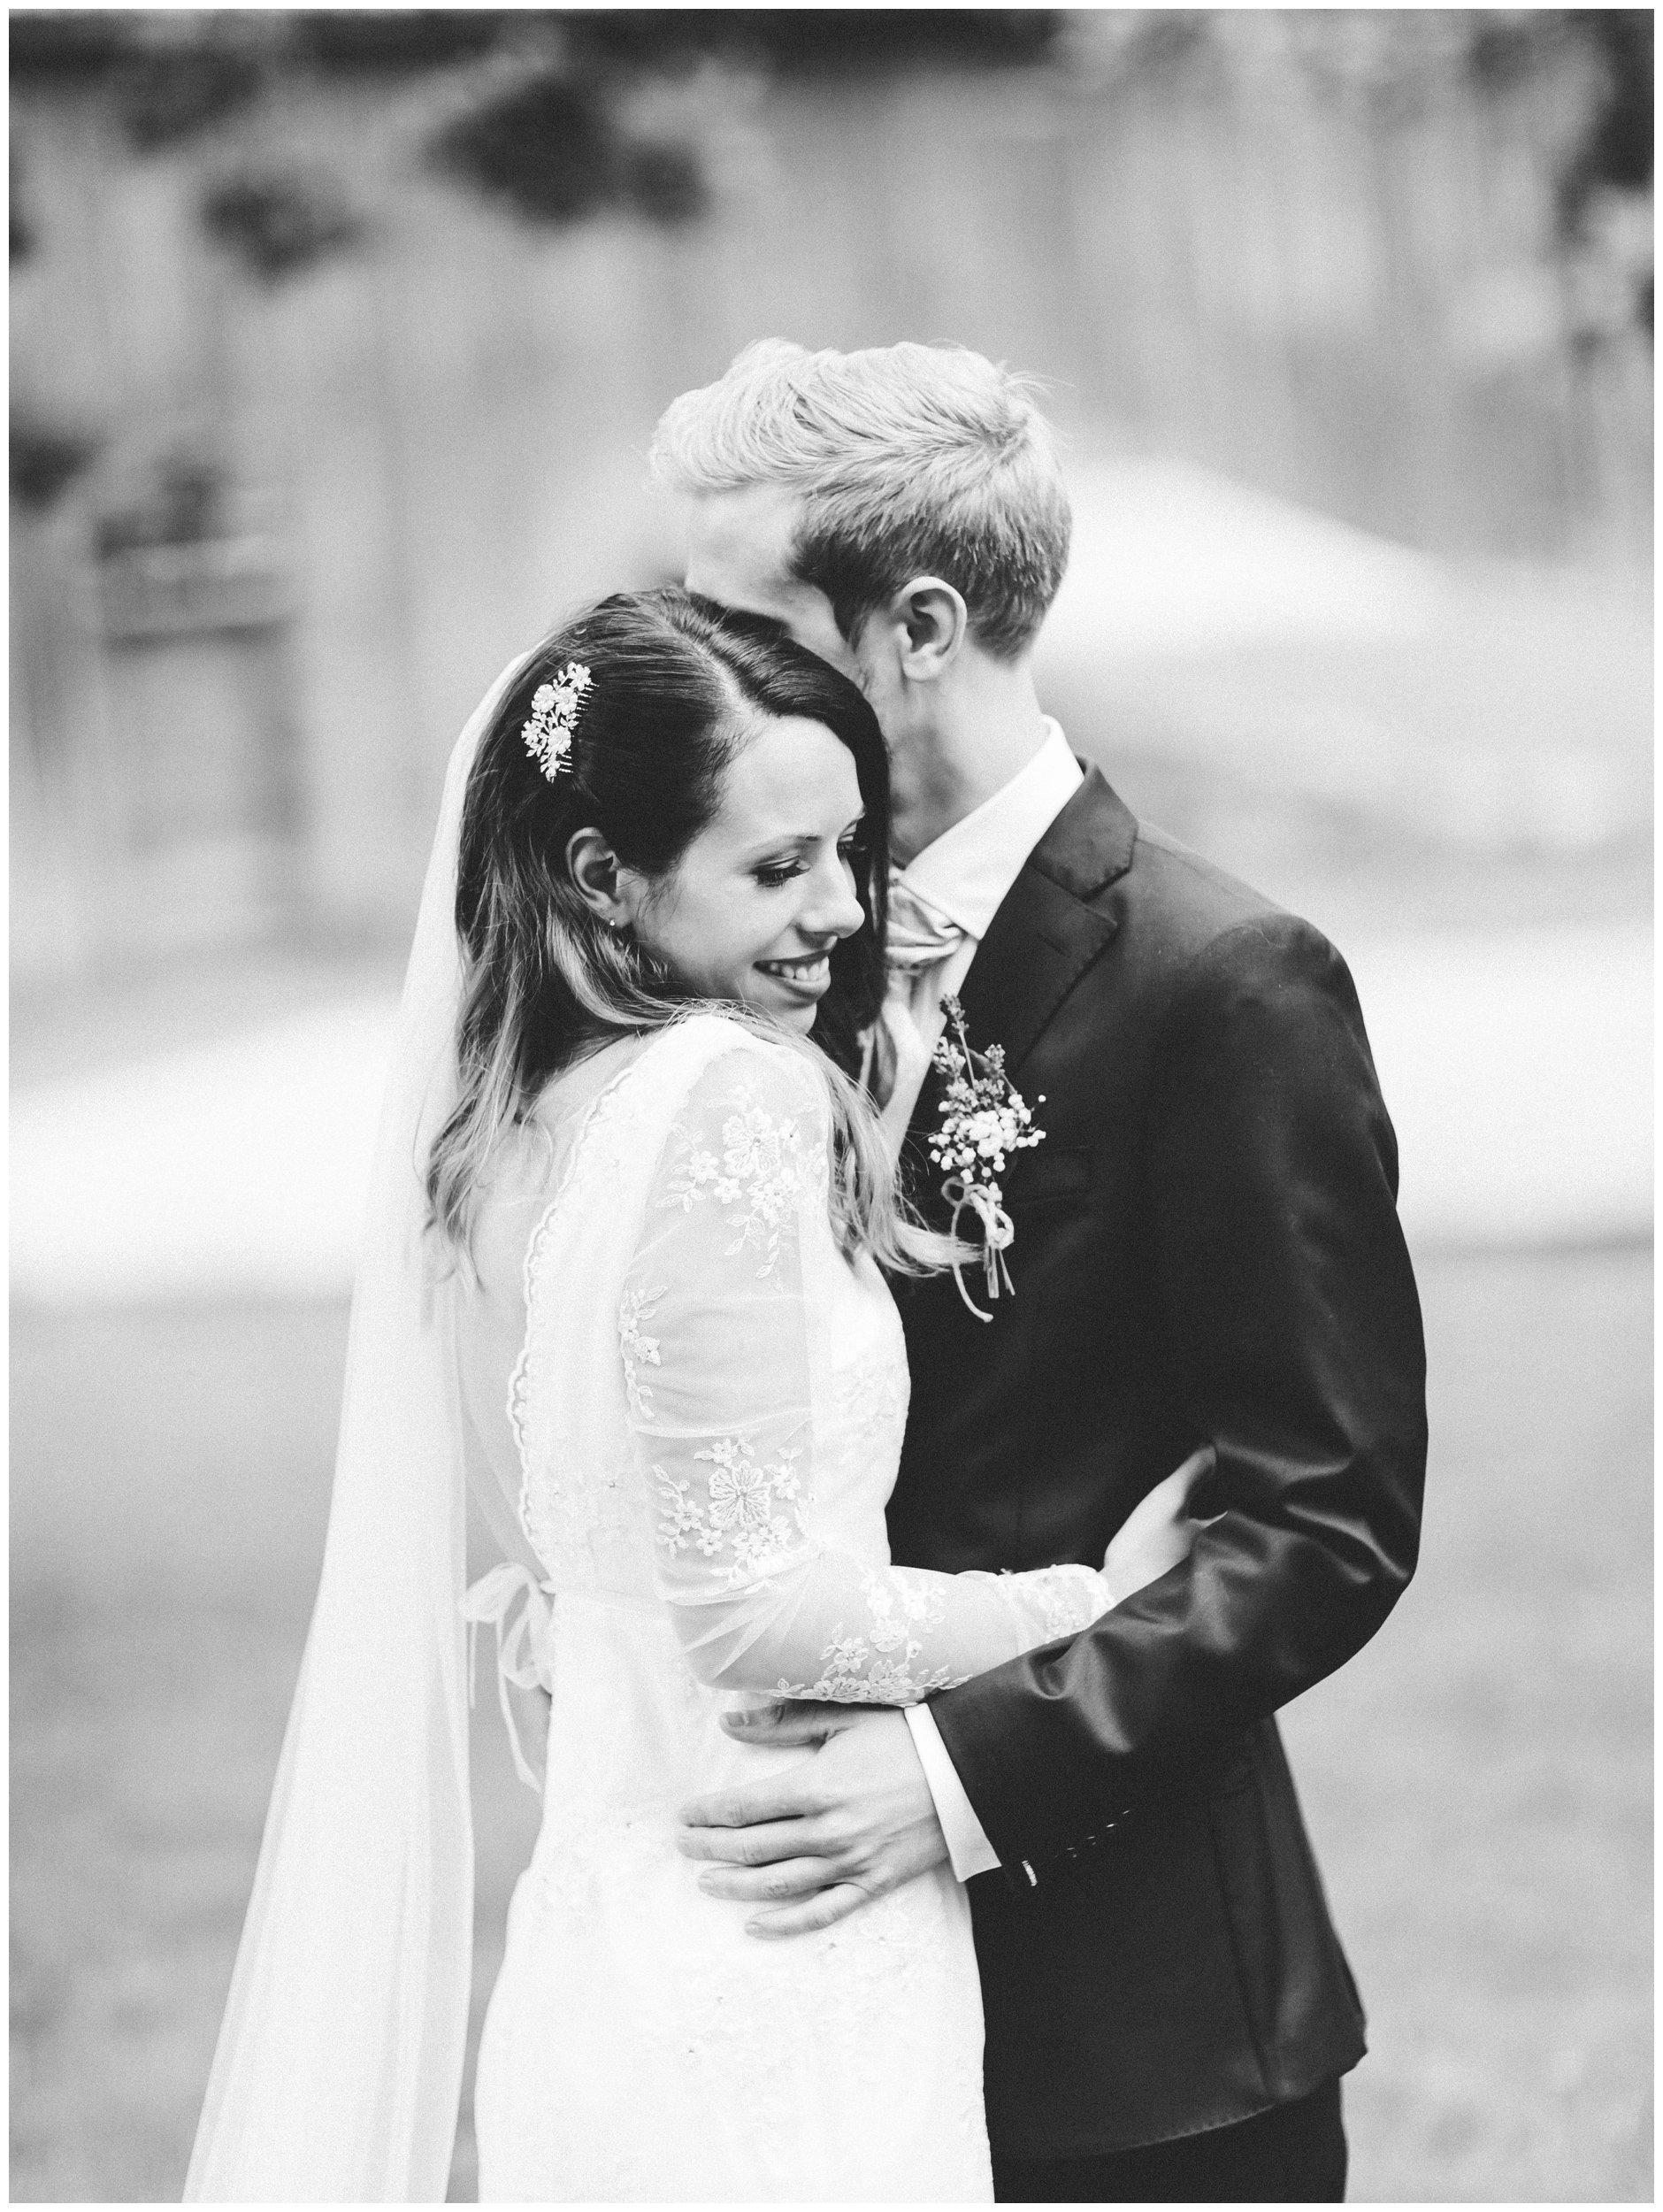 Bryllupsfotografering i naturlig lys klassisk svarthvitt